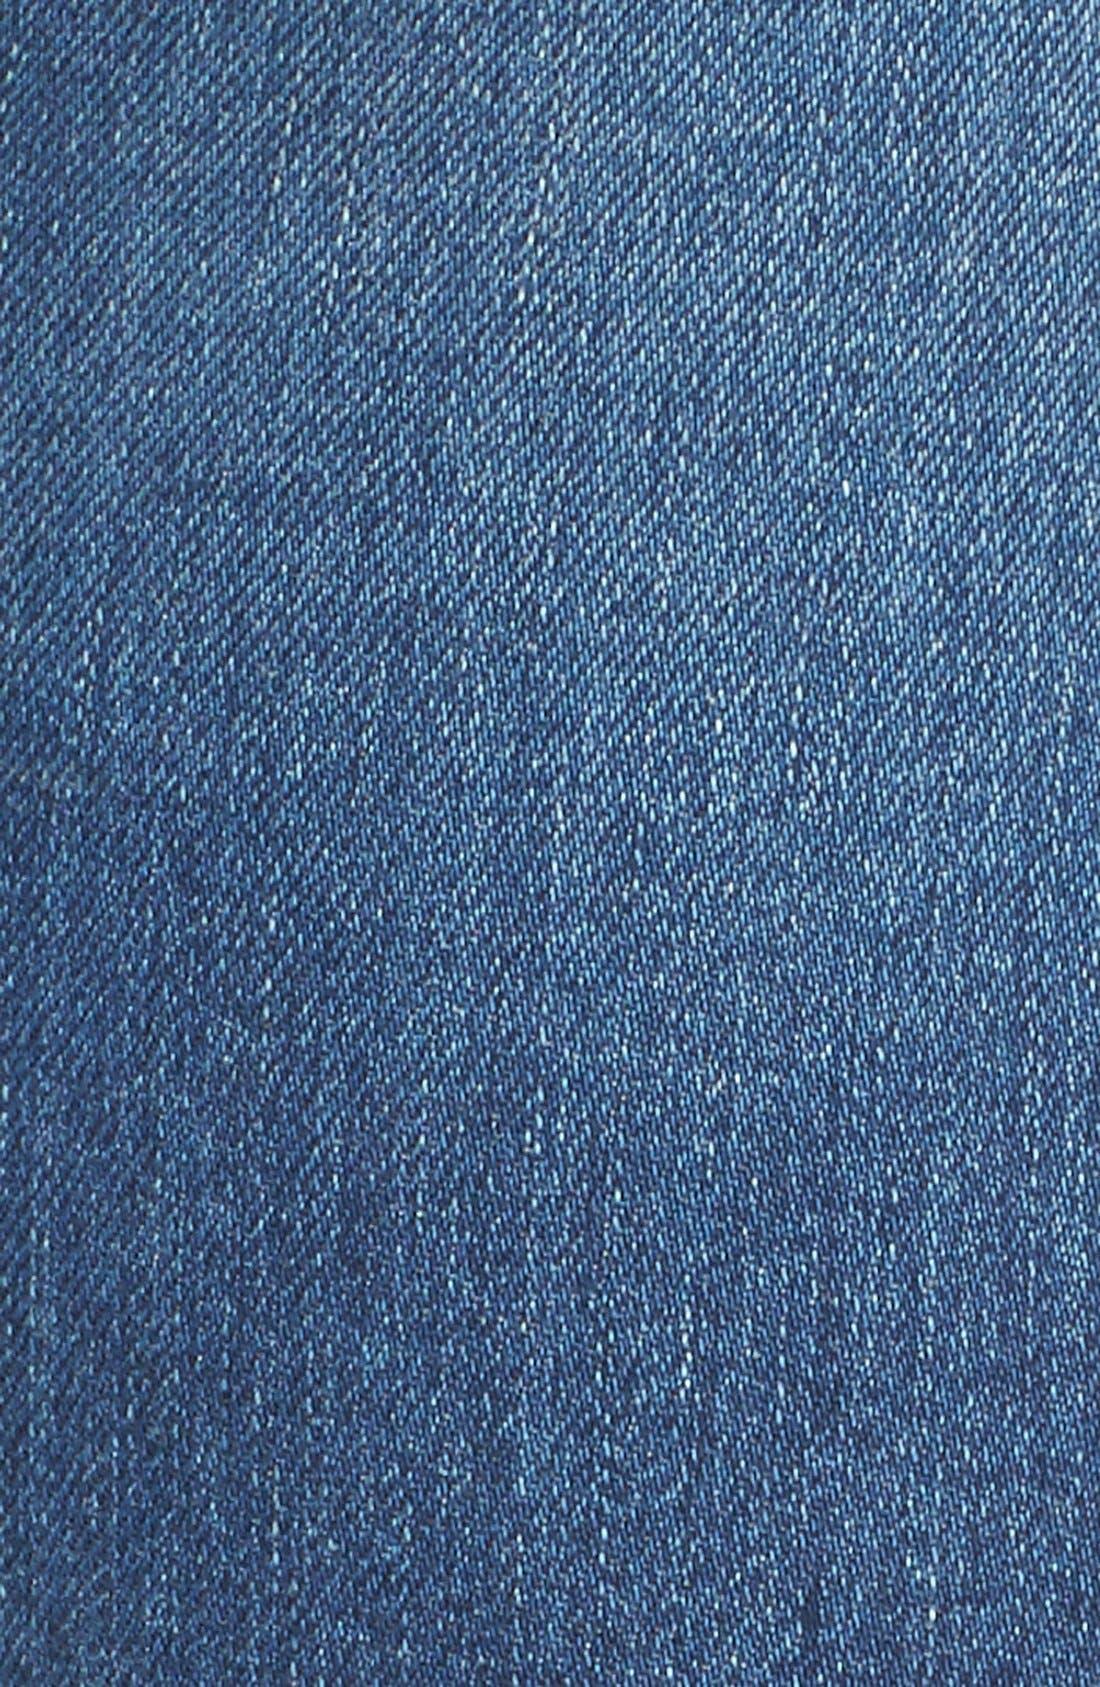 Alternate Image 5  - Hudson Jeans 'Ginny' Rolled Crop Jeans (Point Break)